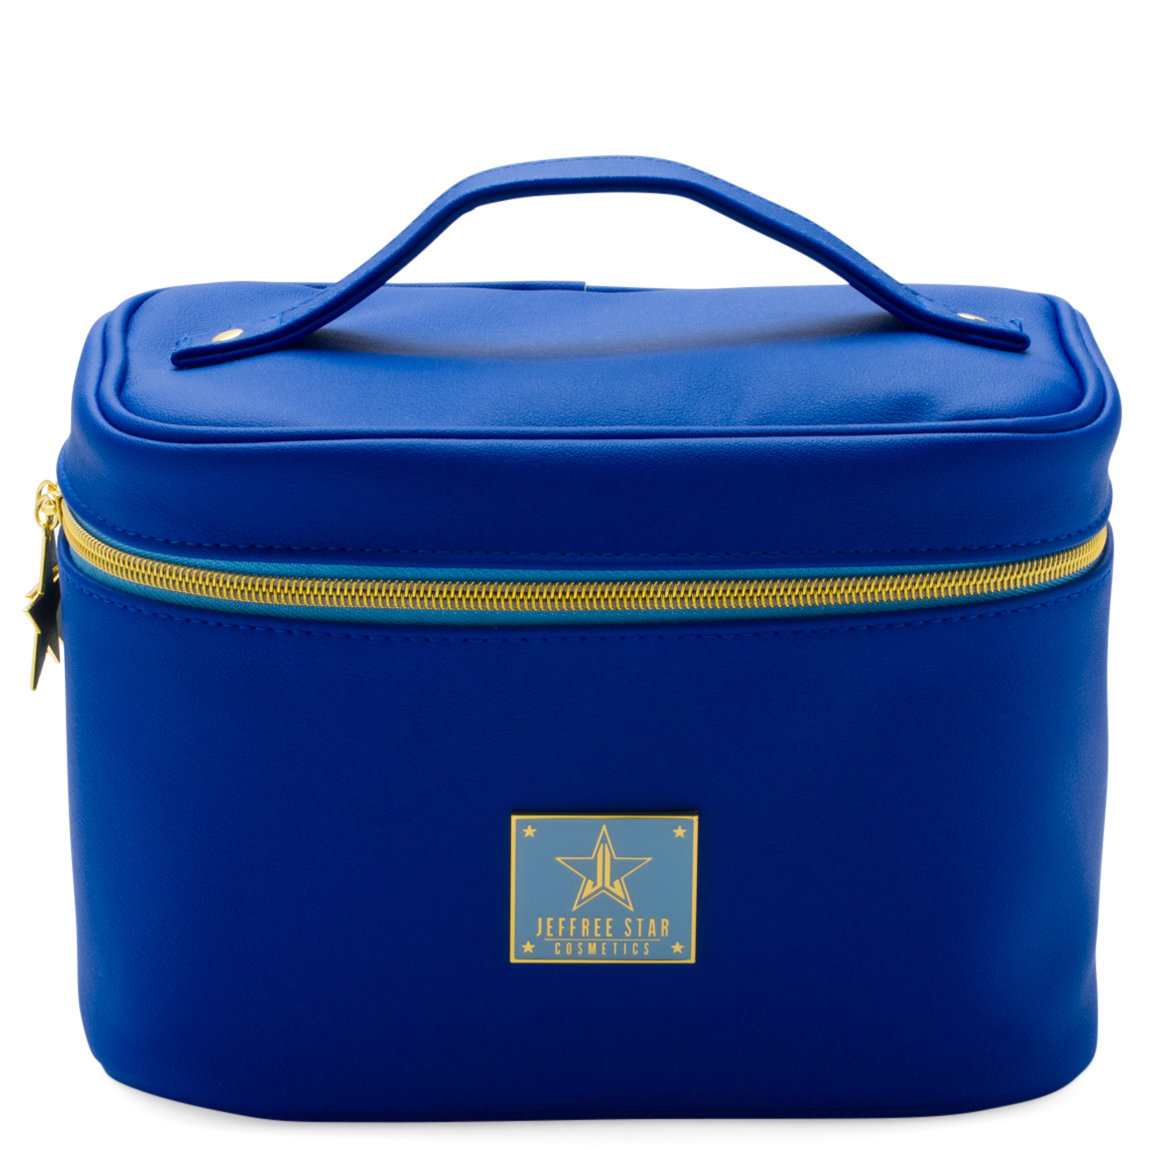 Jeffree Star Cosmetics Travel Makeup Bag Dark Blue product swatch.